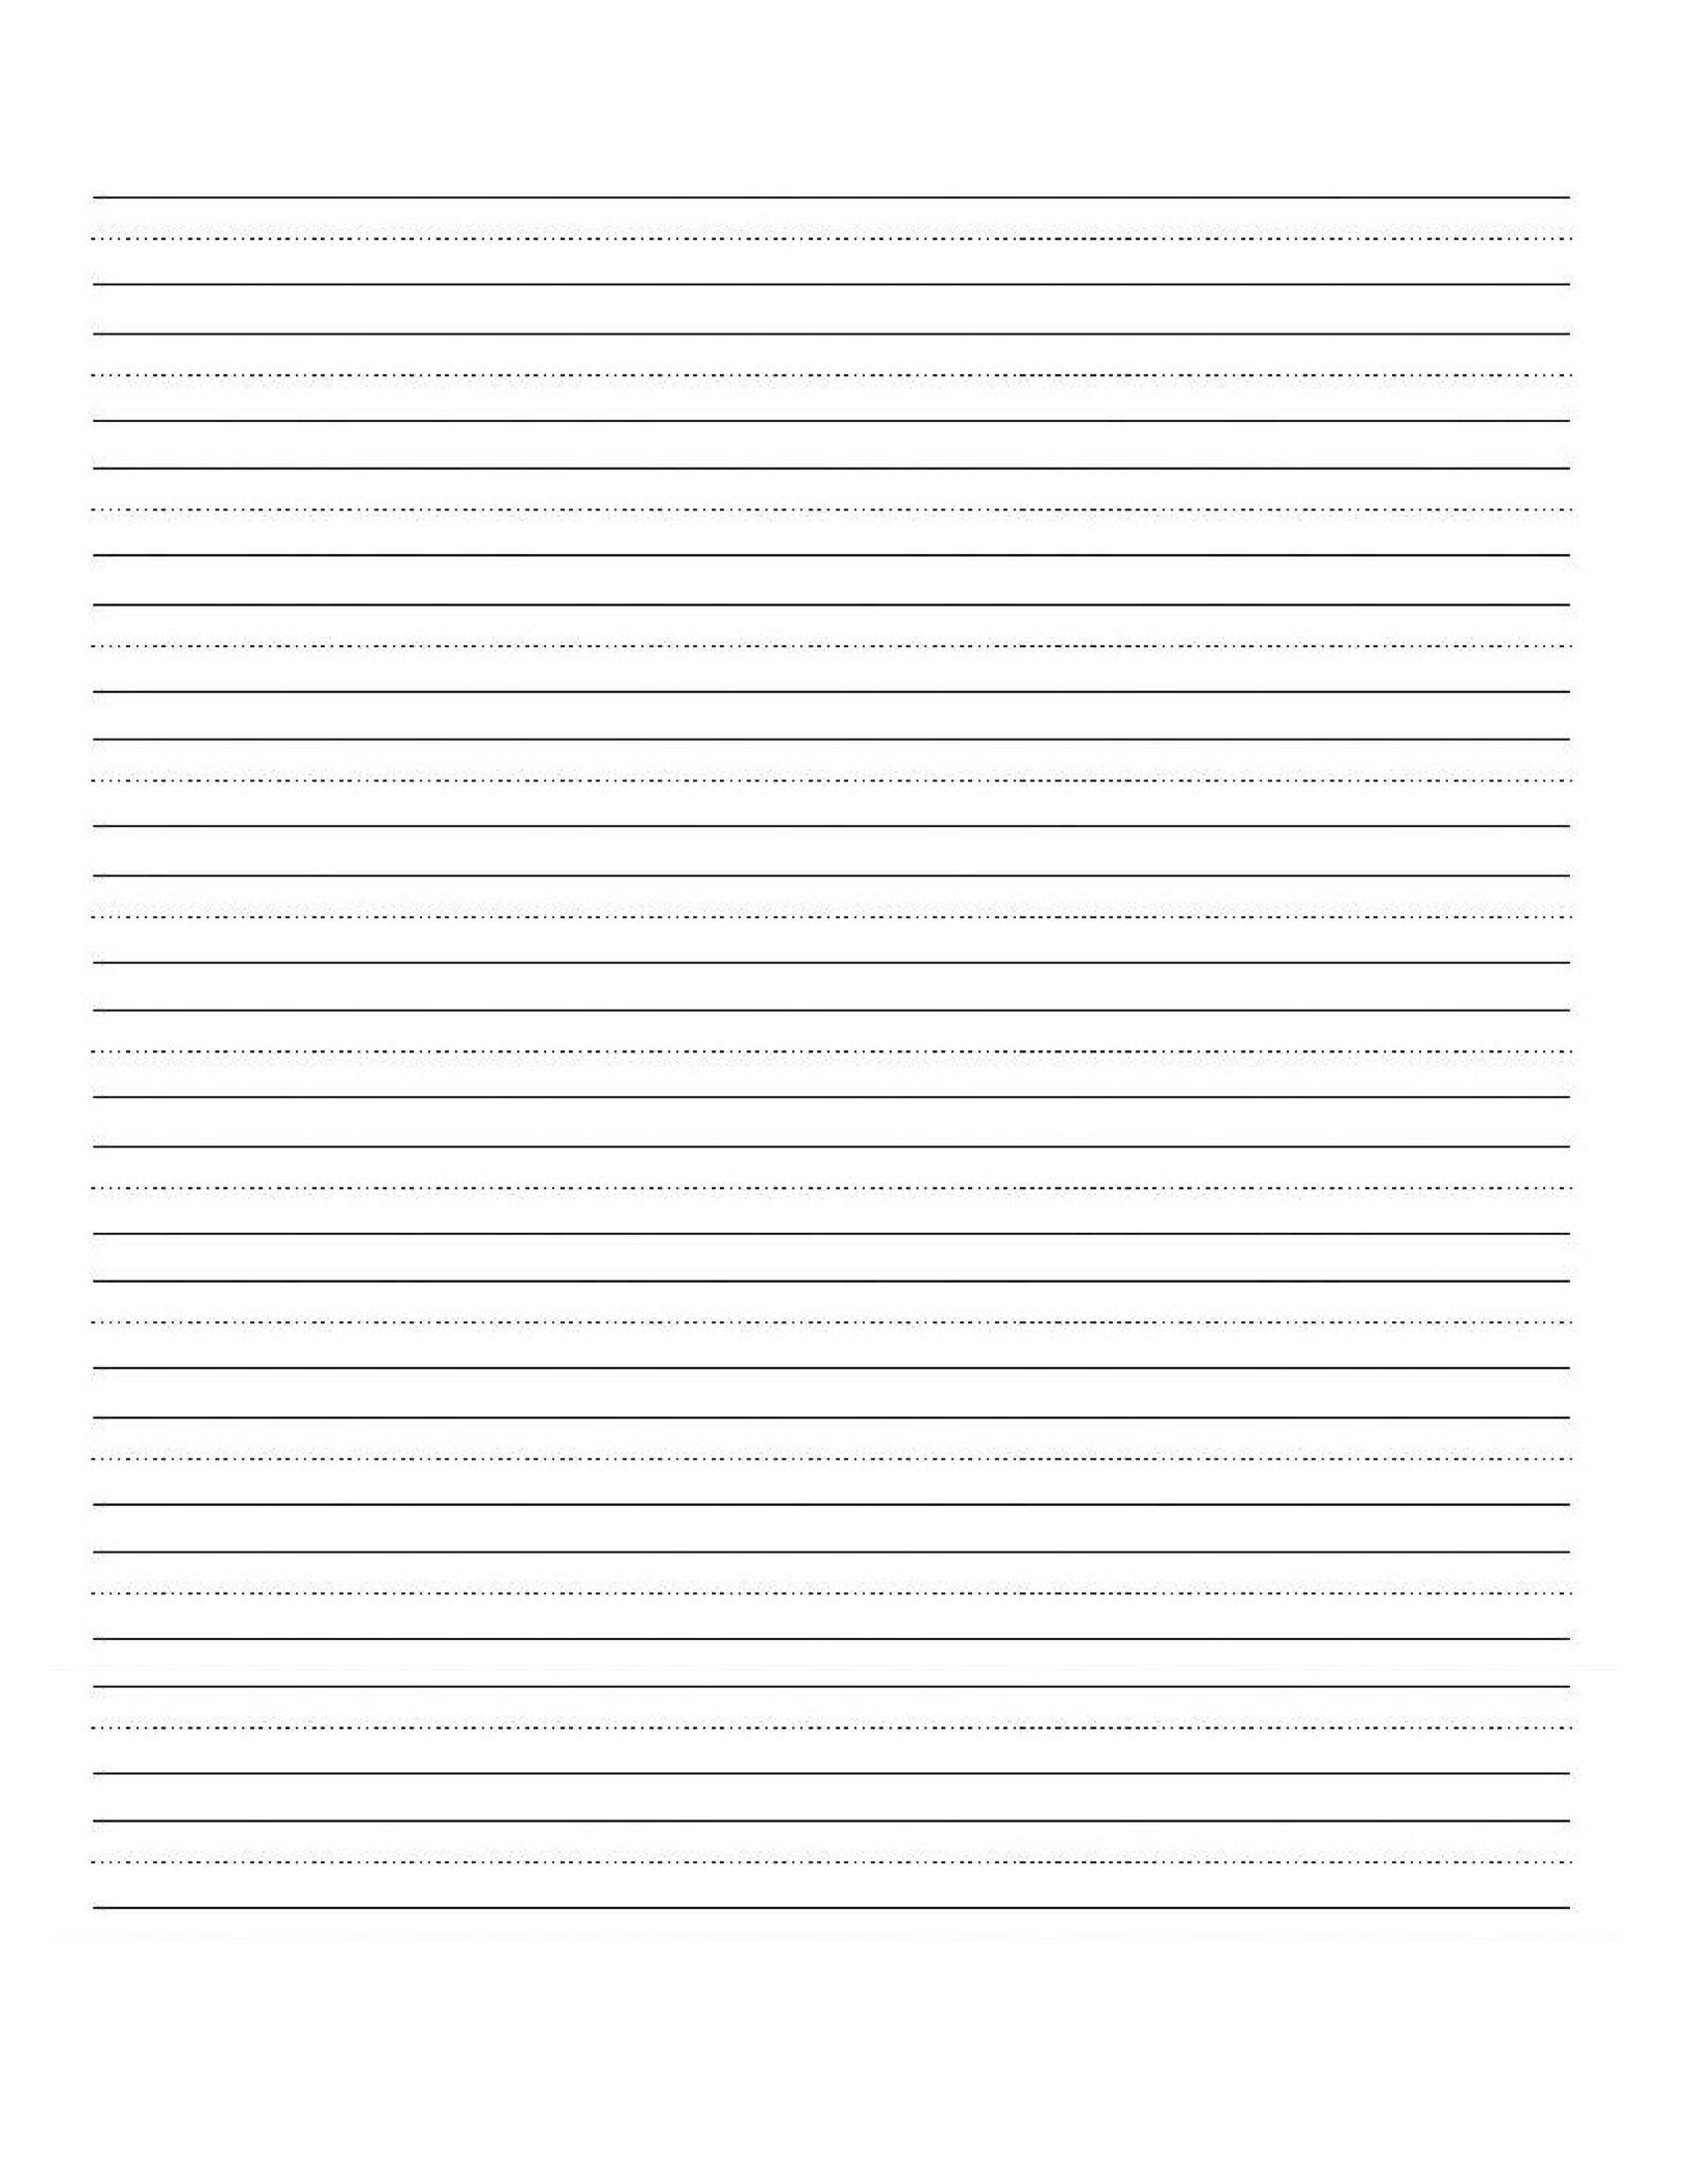 Blank Handwriting Worksheets For Kindergarten